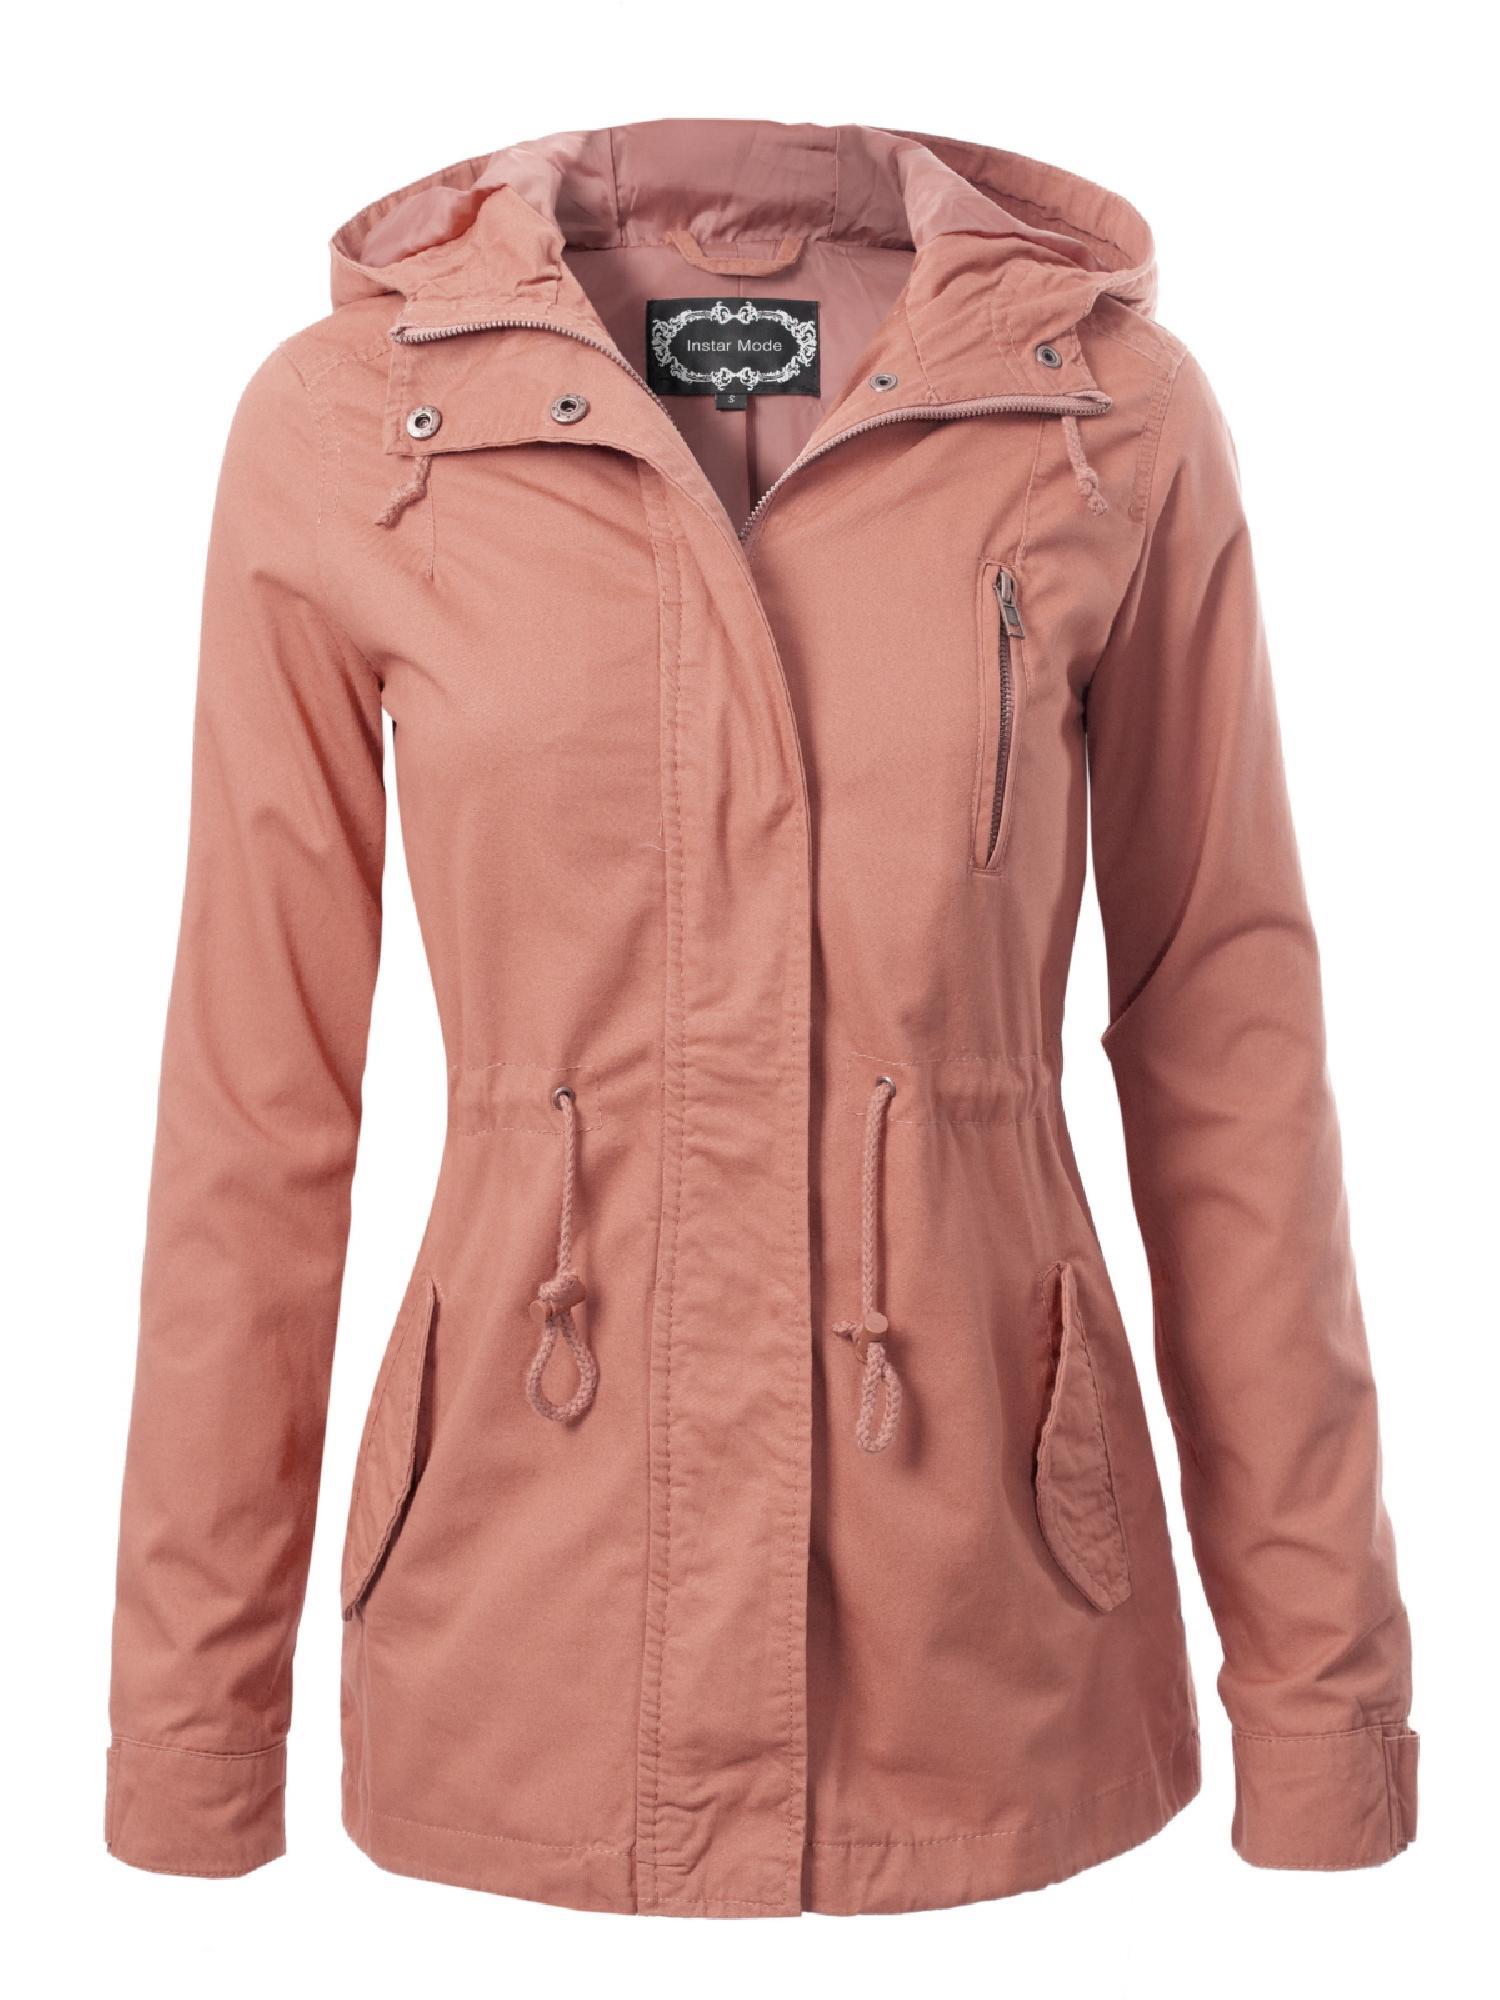 Made by Olivia Women's Military Anorak Safari Hoodie Jacket Mauve 2XL